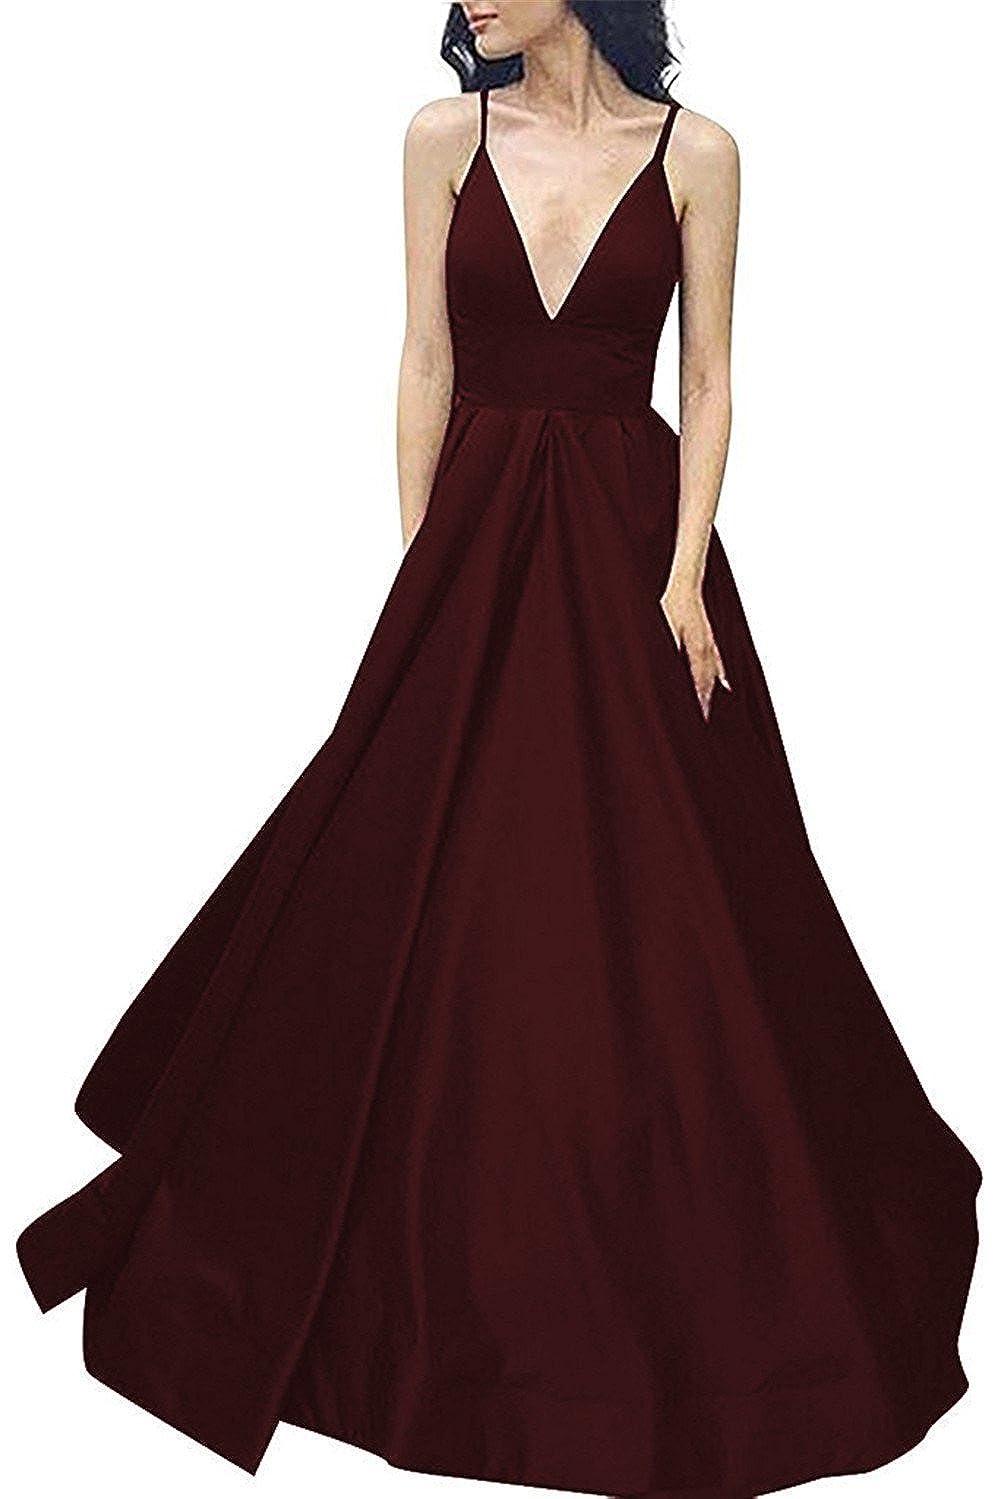 Brown Yiweir Women's Prom Dresses 2018 Long ALine High Waist Satin Formal Gowns YP028